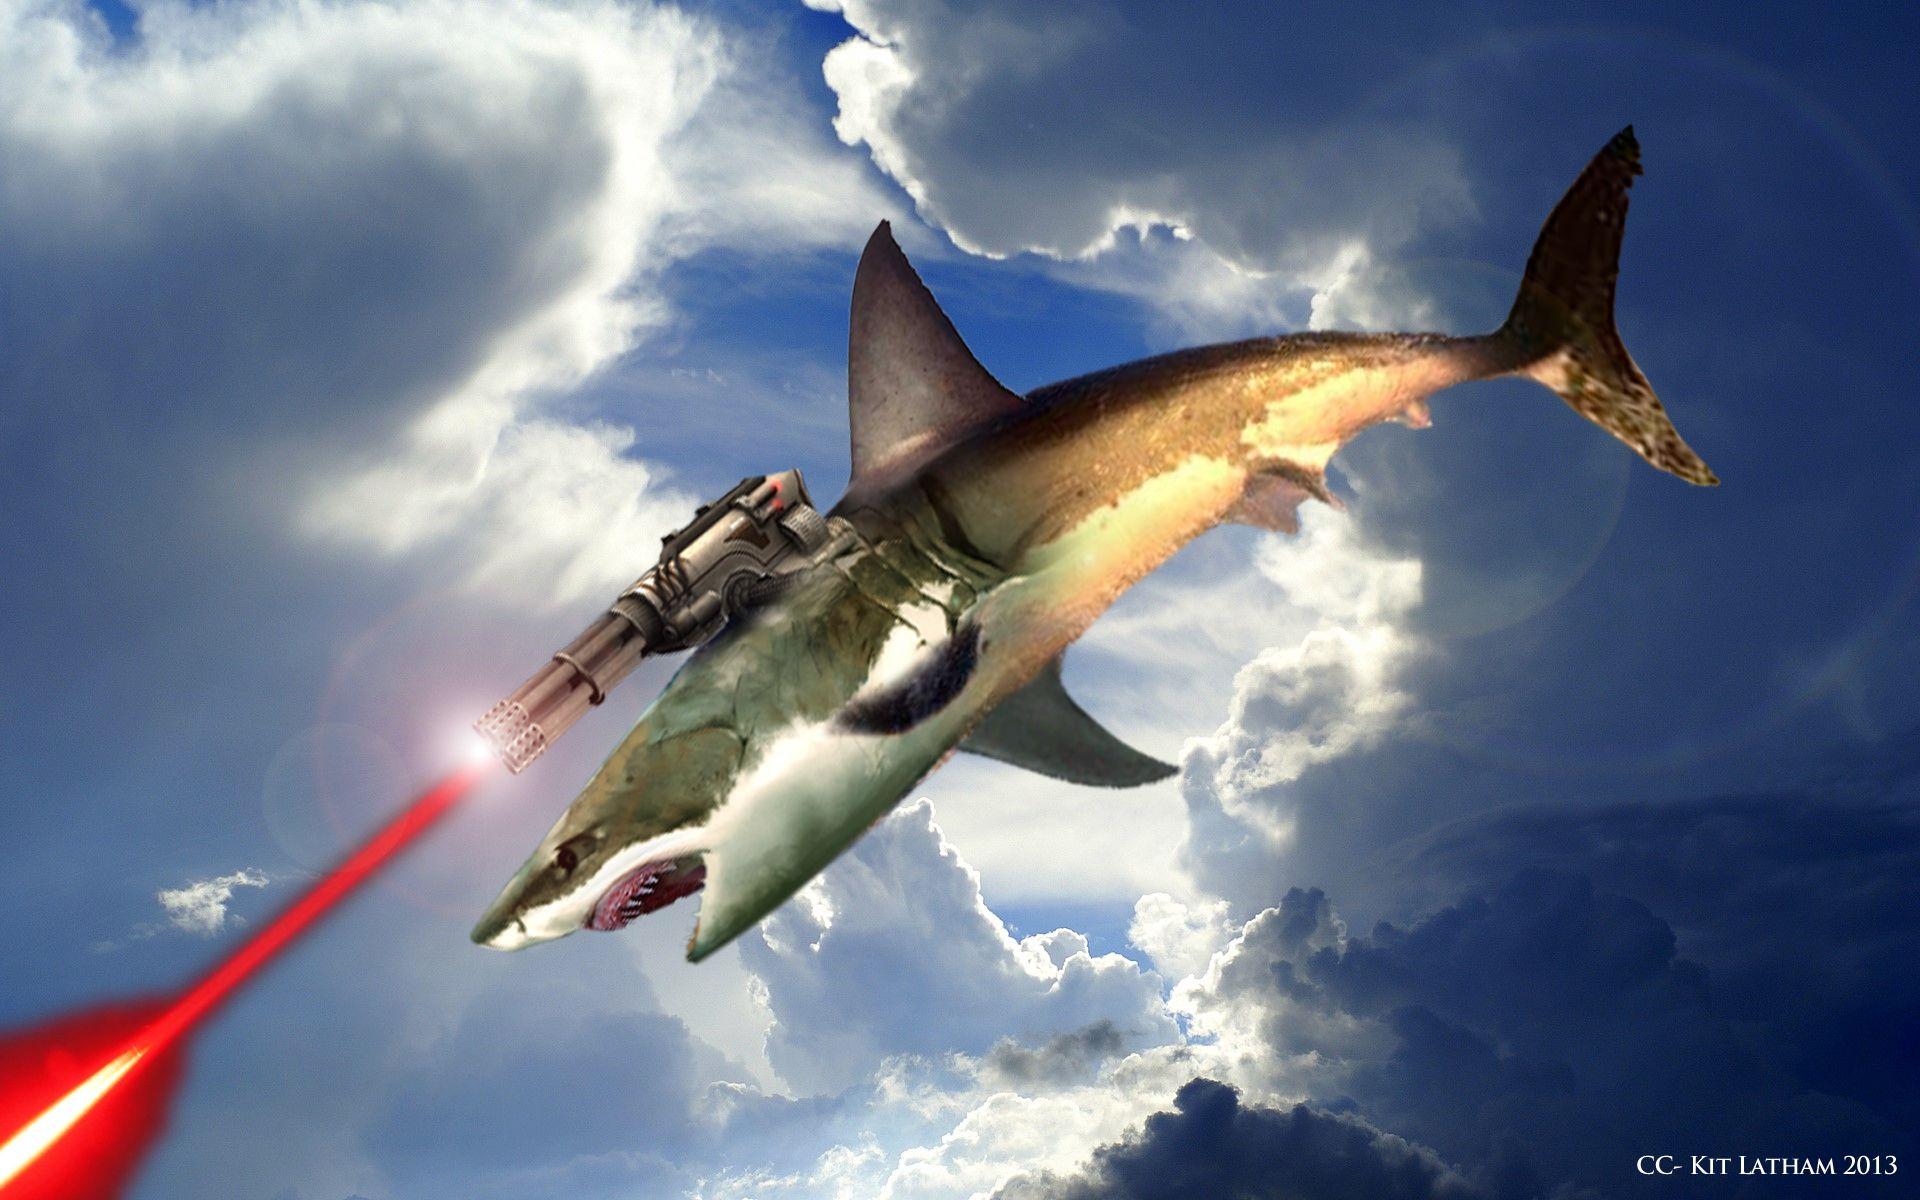 Flying Sharks With Lasers Shark, Save the sharks, Shark meme